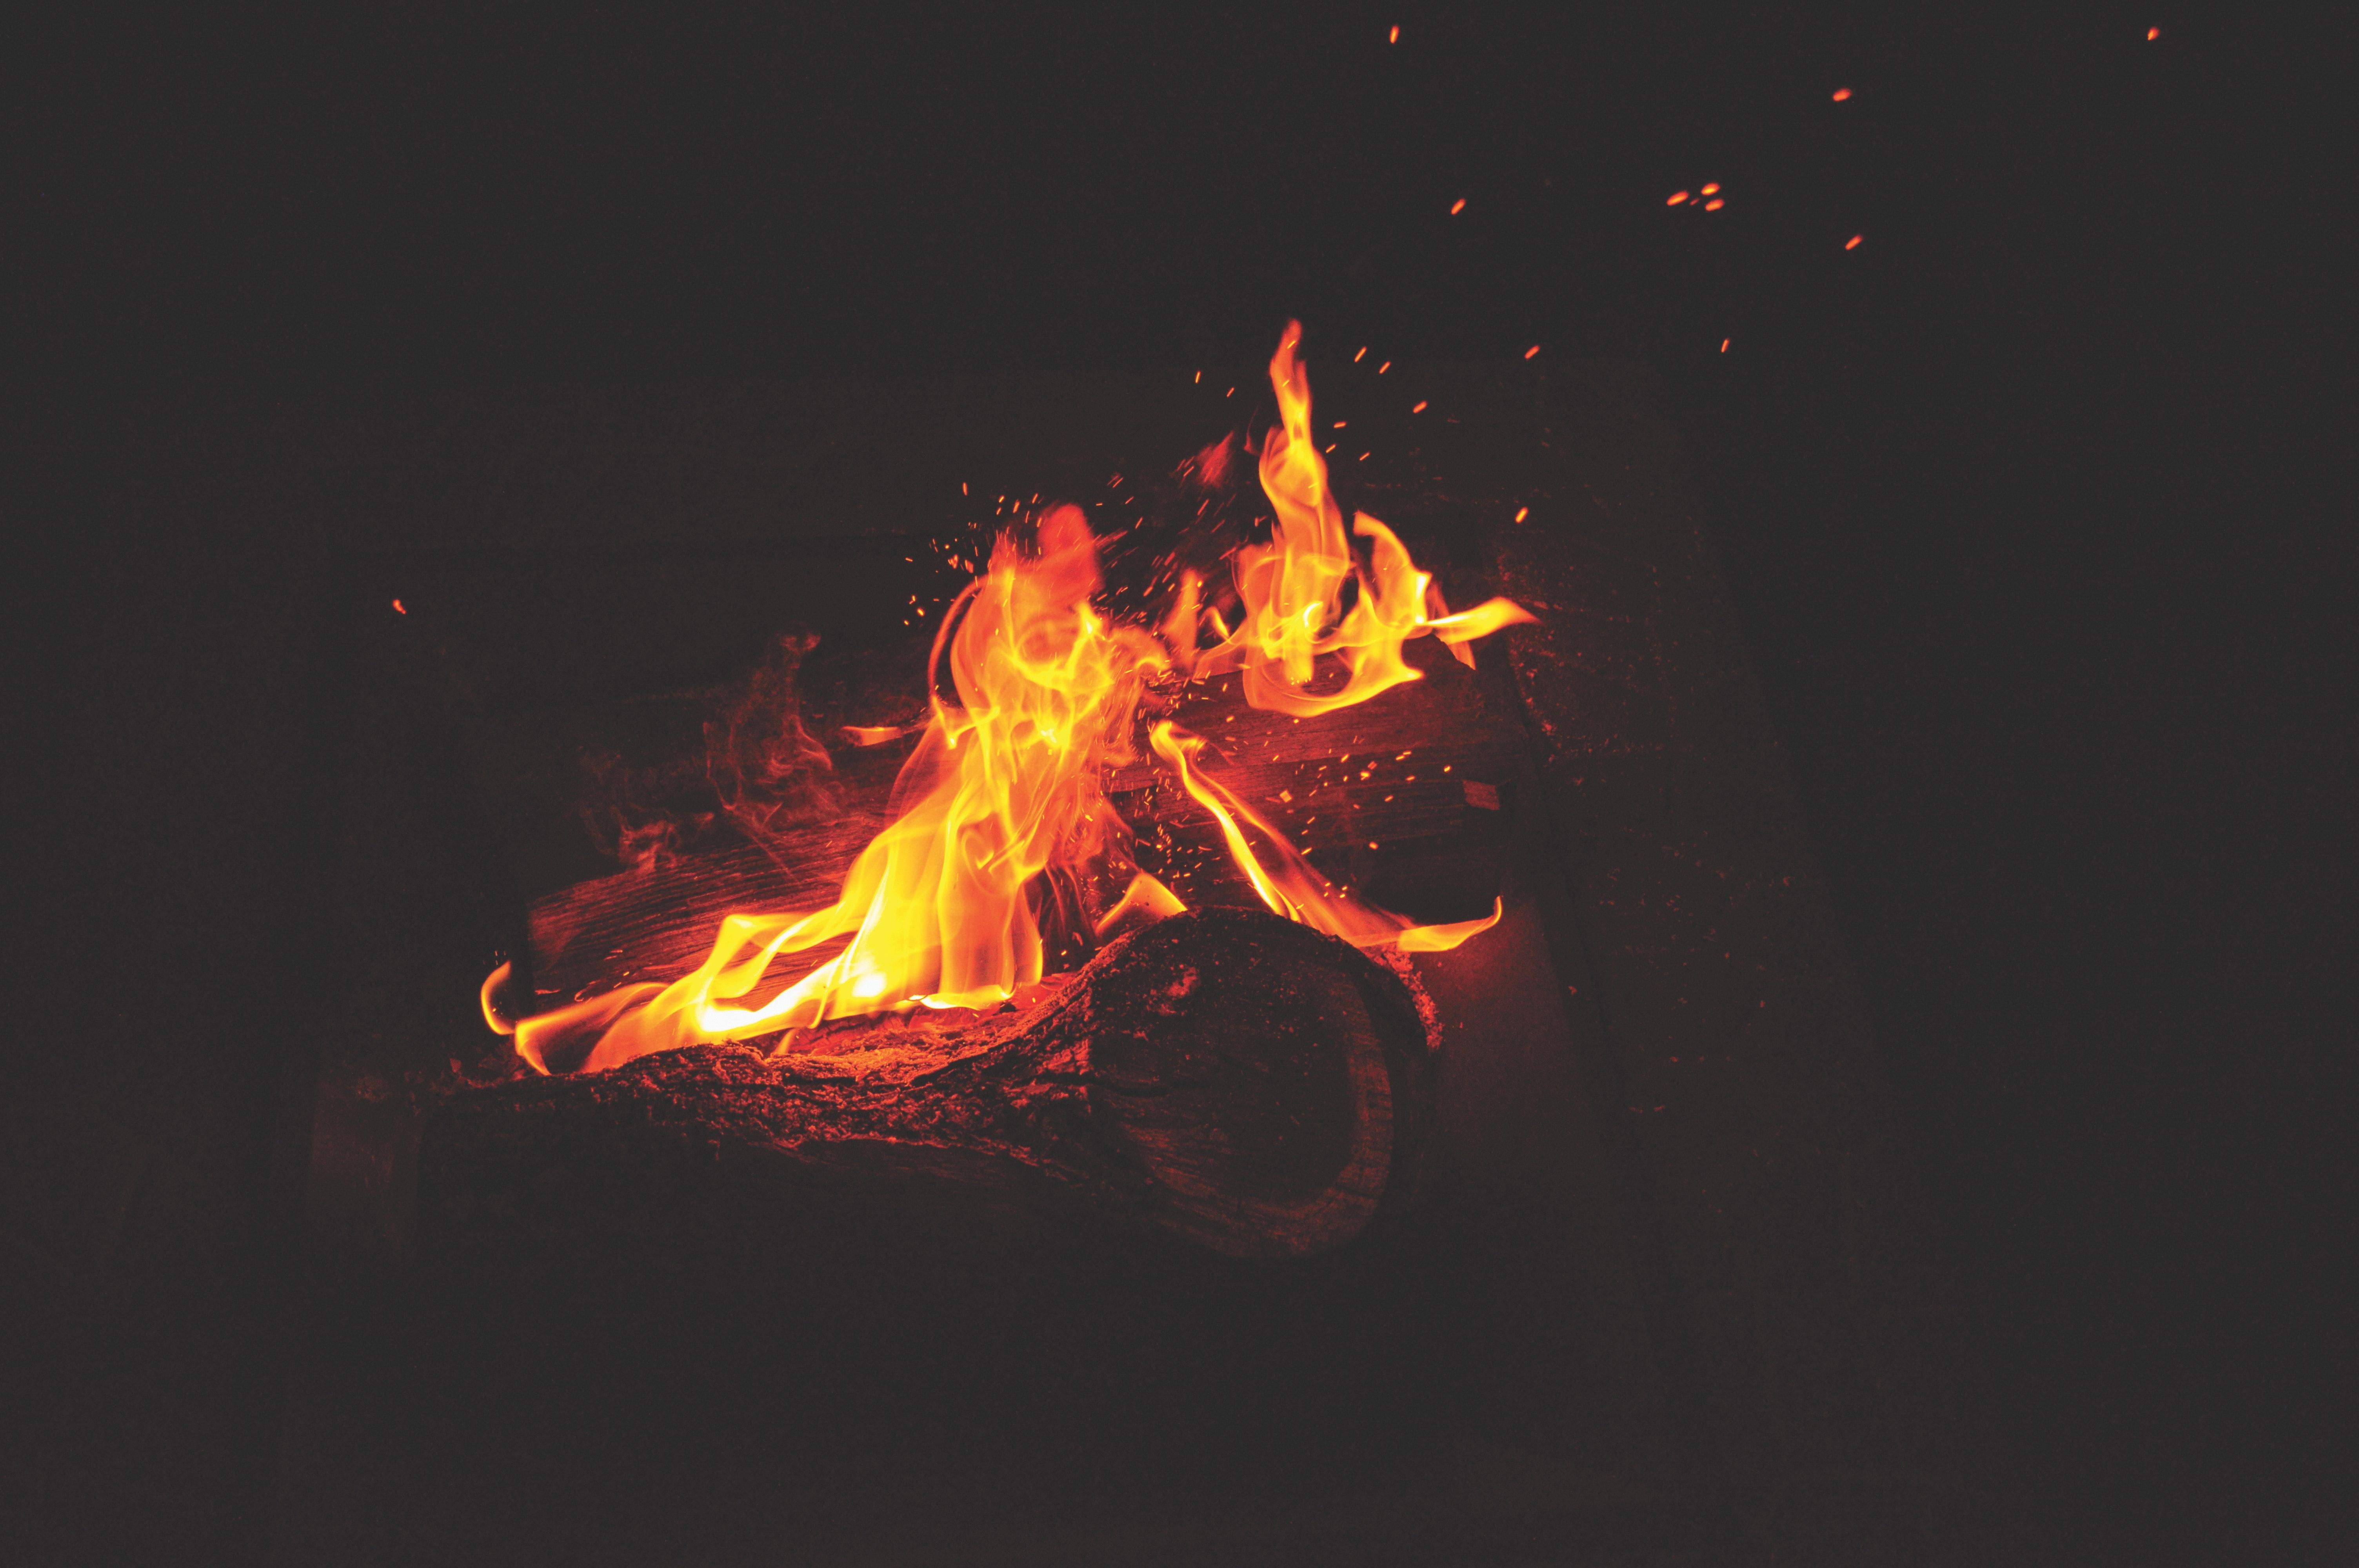 Ảnh Background lửa buồn